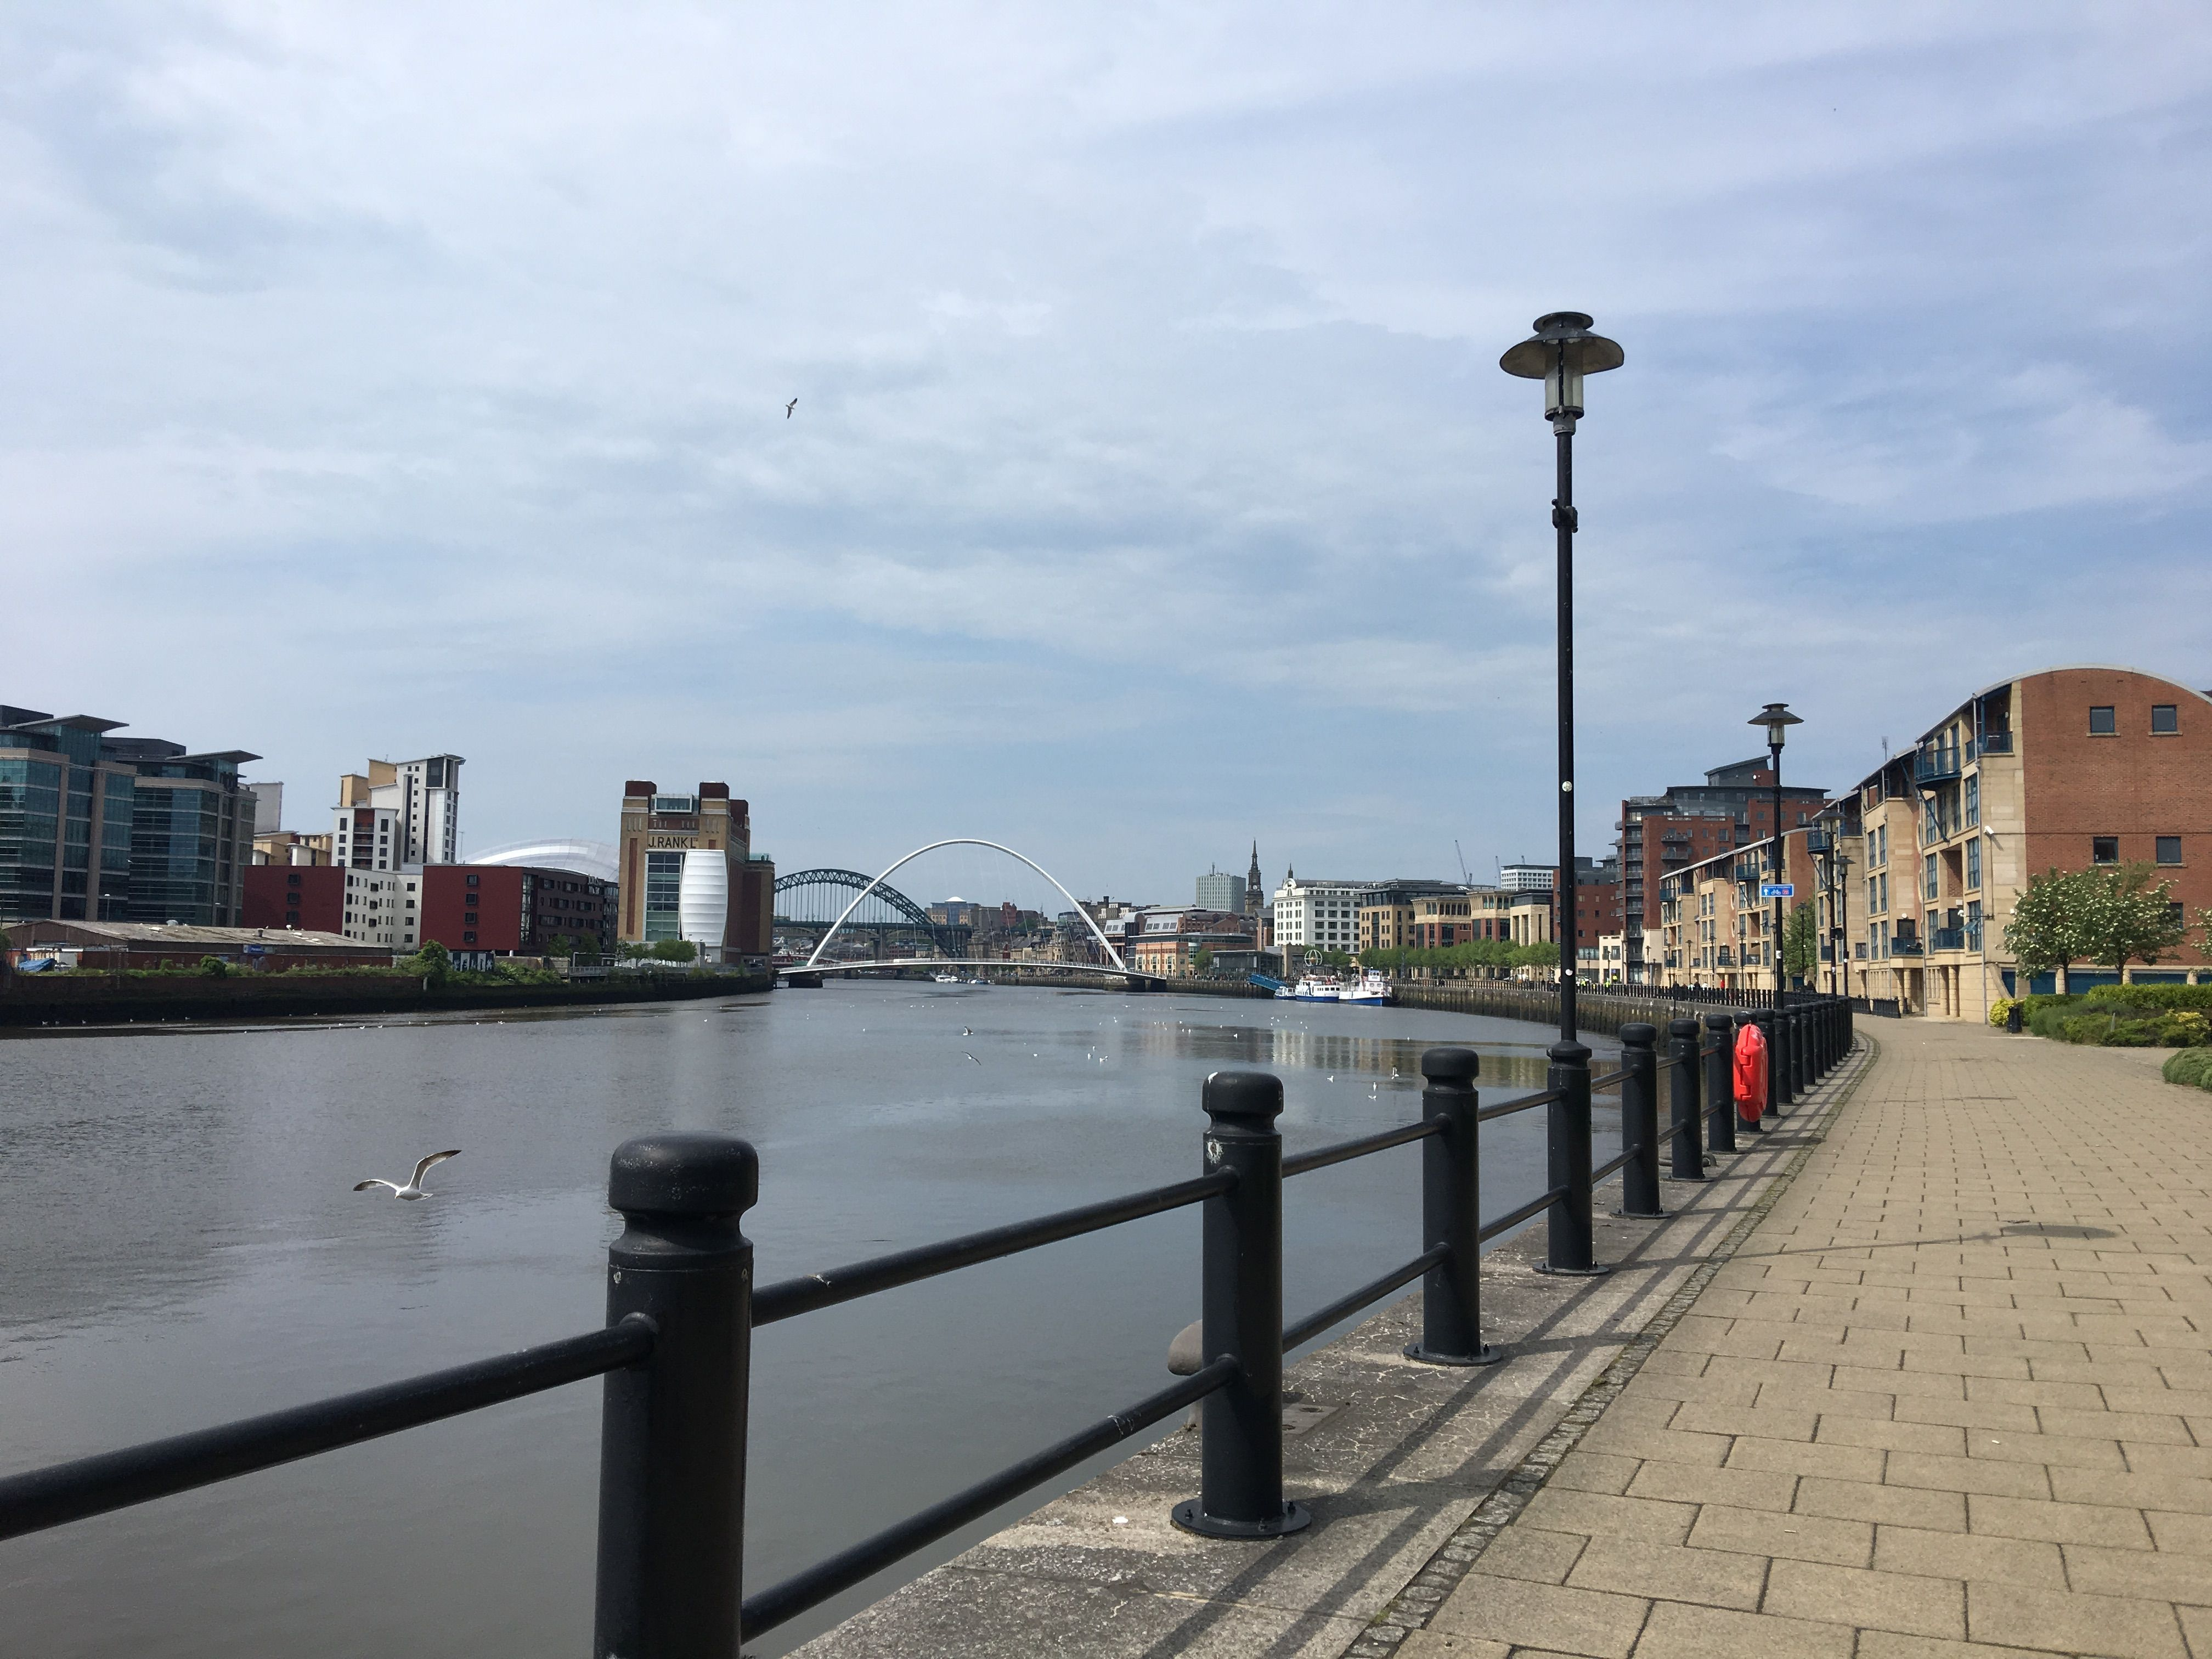 Newcastle Castle - Empnefsys & Travel